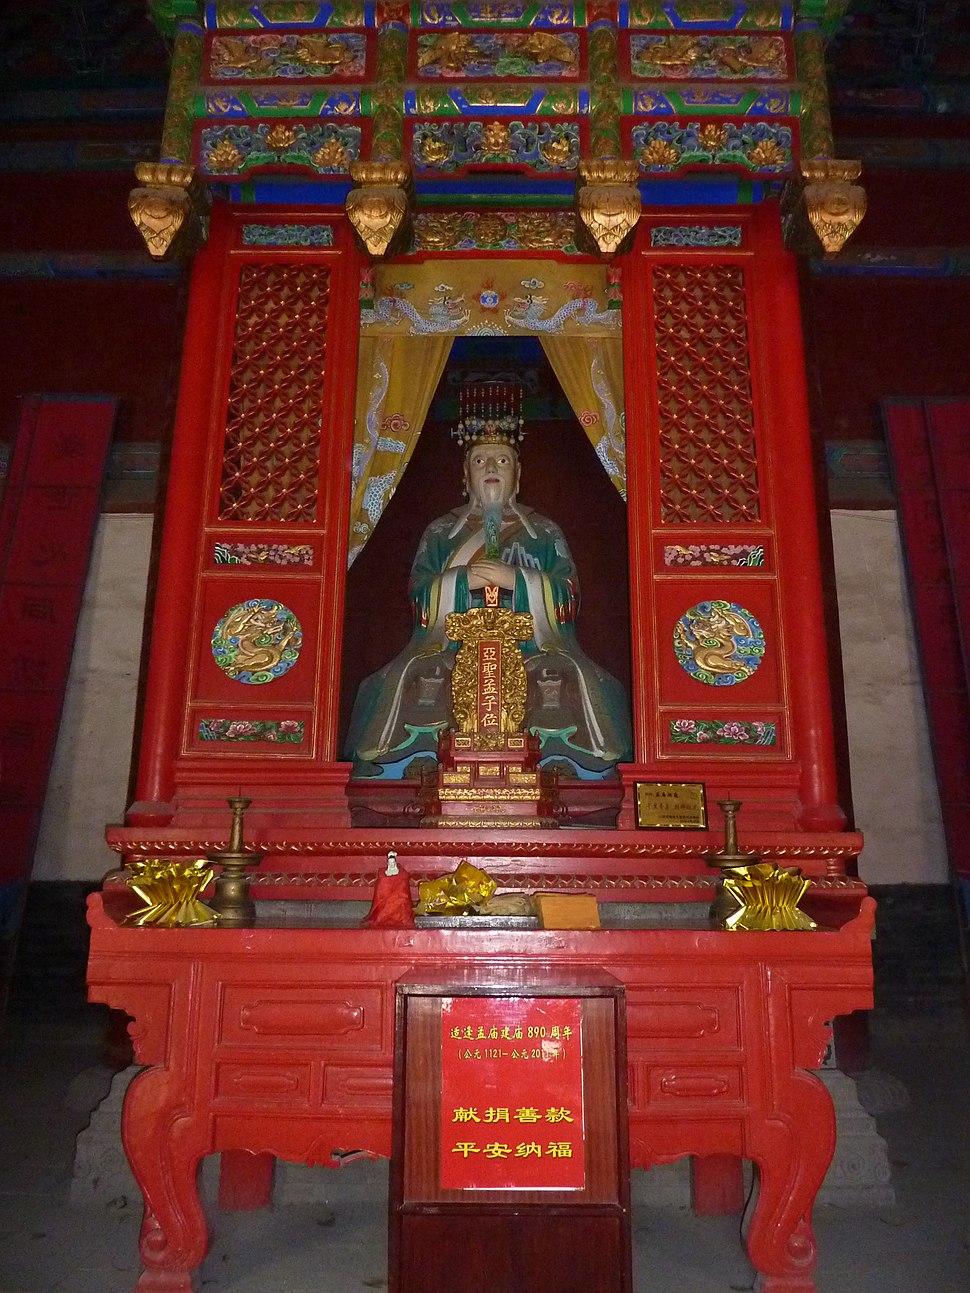 Temple of Mencius - Yasheng Hall - inside - P1050921